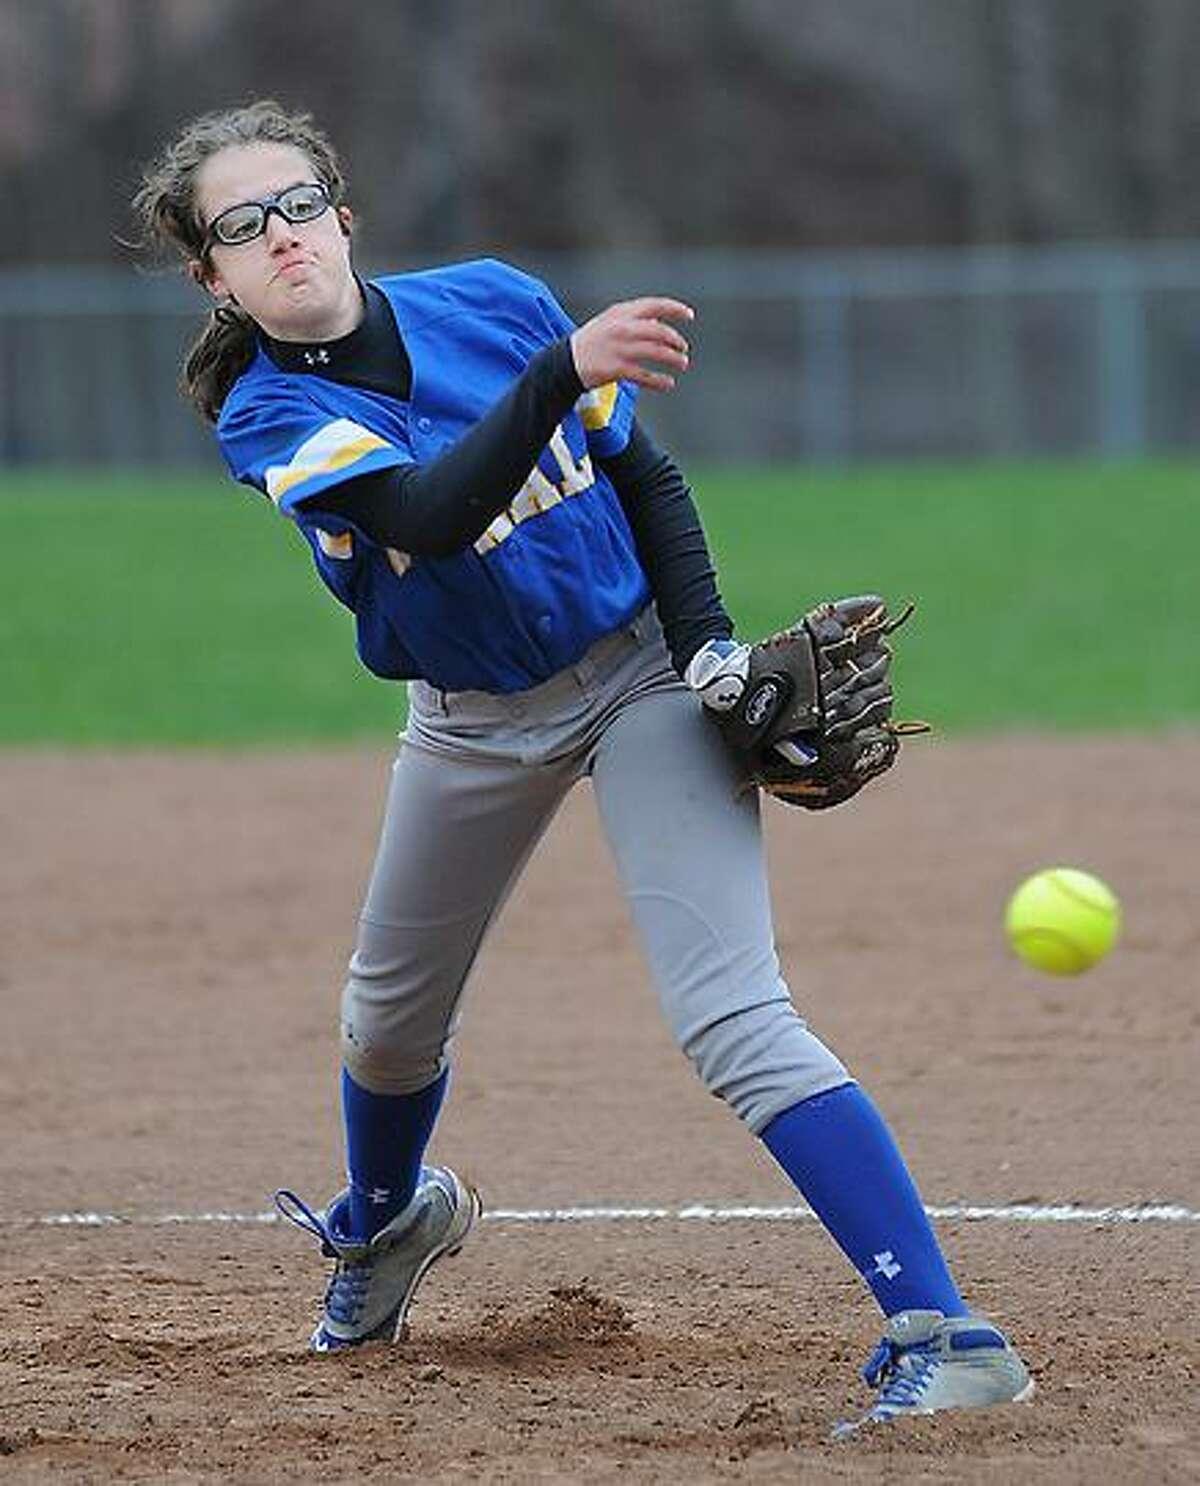 Catherine Avalone/The Middletown Press Vinal Tech freshman pitcher Hannah Bibisi on the mound earlier this season.